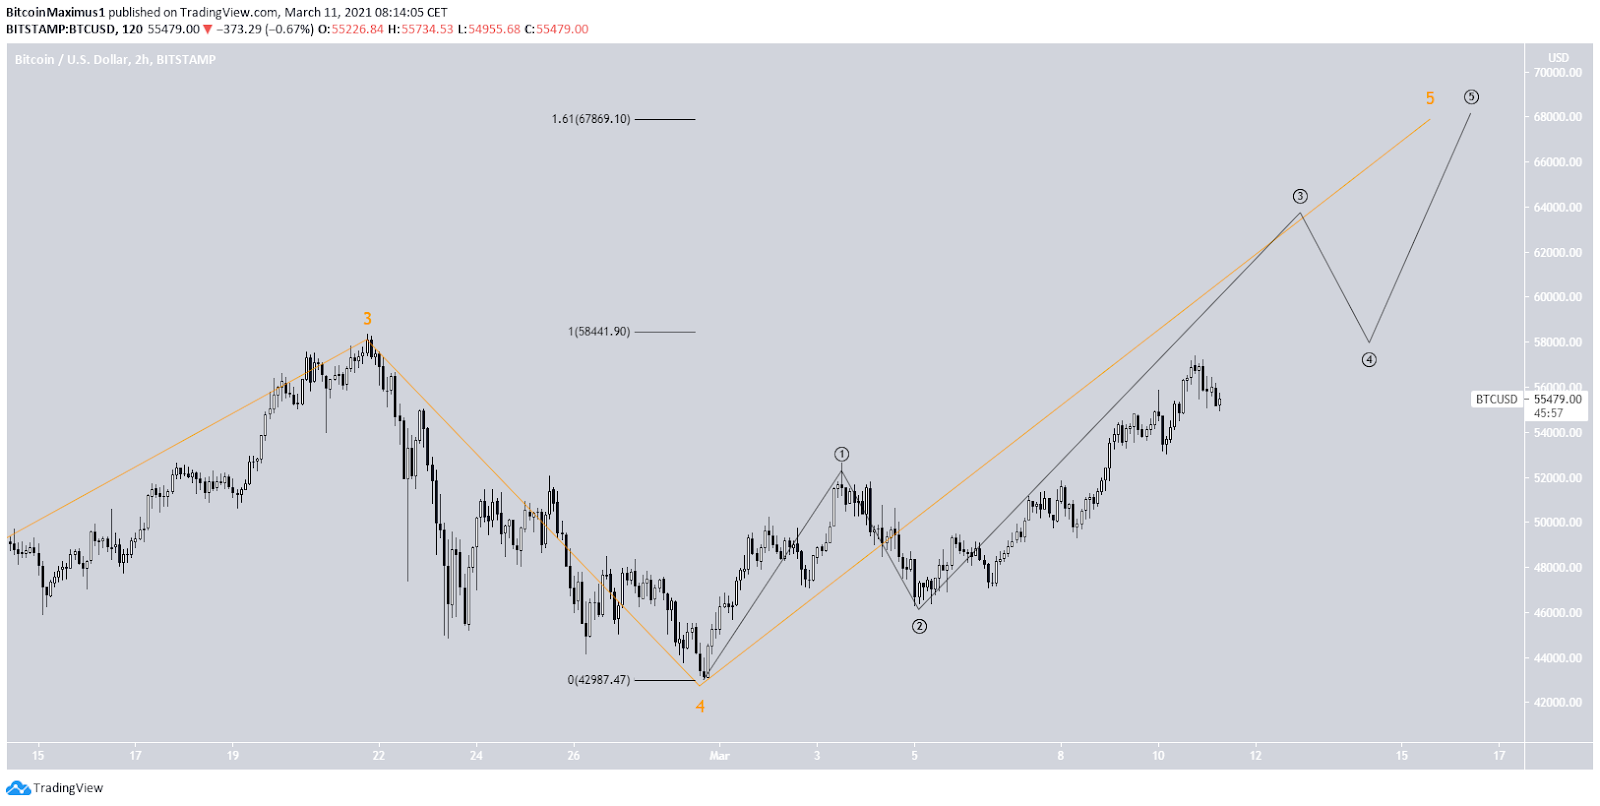 Bitcoin Preis Wellenanalyse